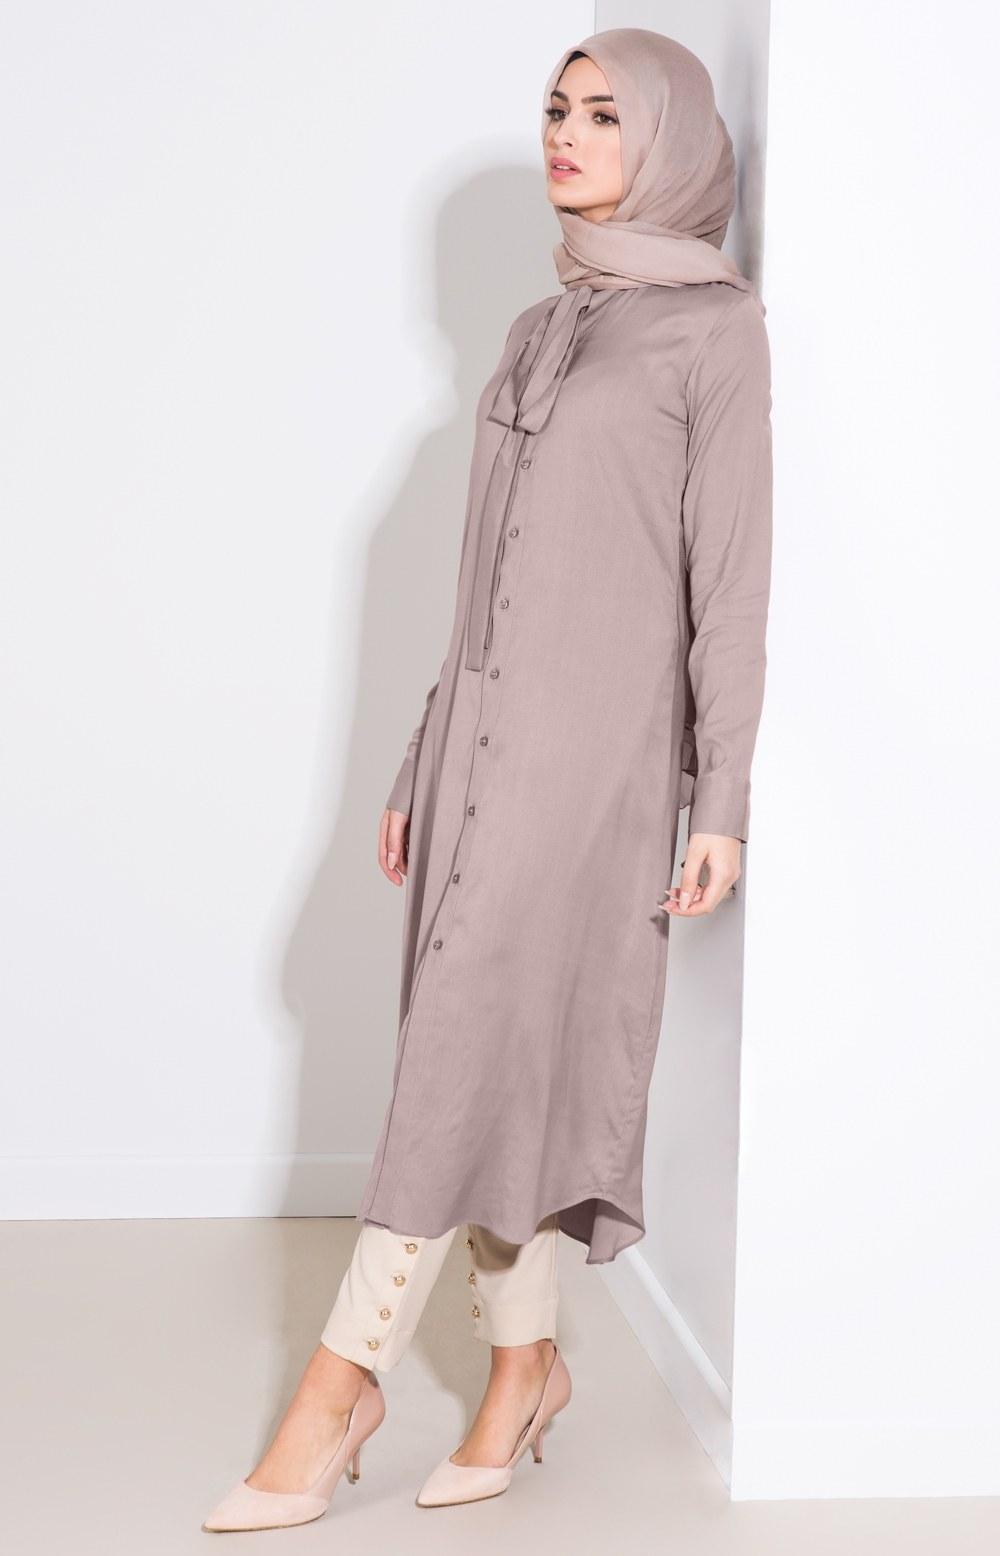 Model Baju Lebaran Baju Lebaran Nkde 25 Trend Model Baju Muslim Lebaran 2018 Simple & Modis